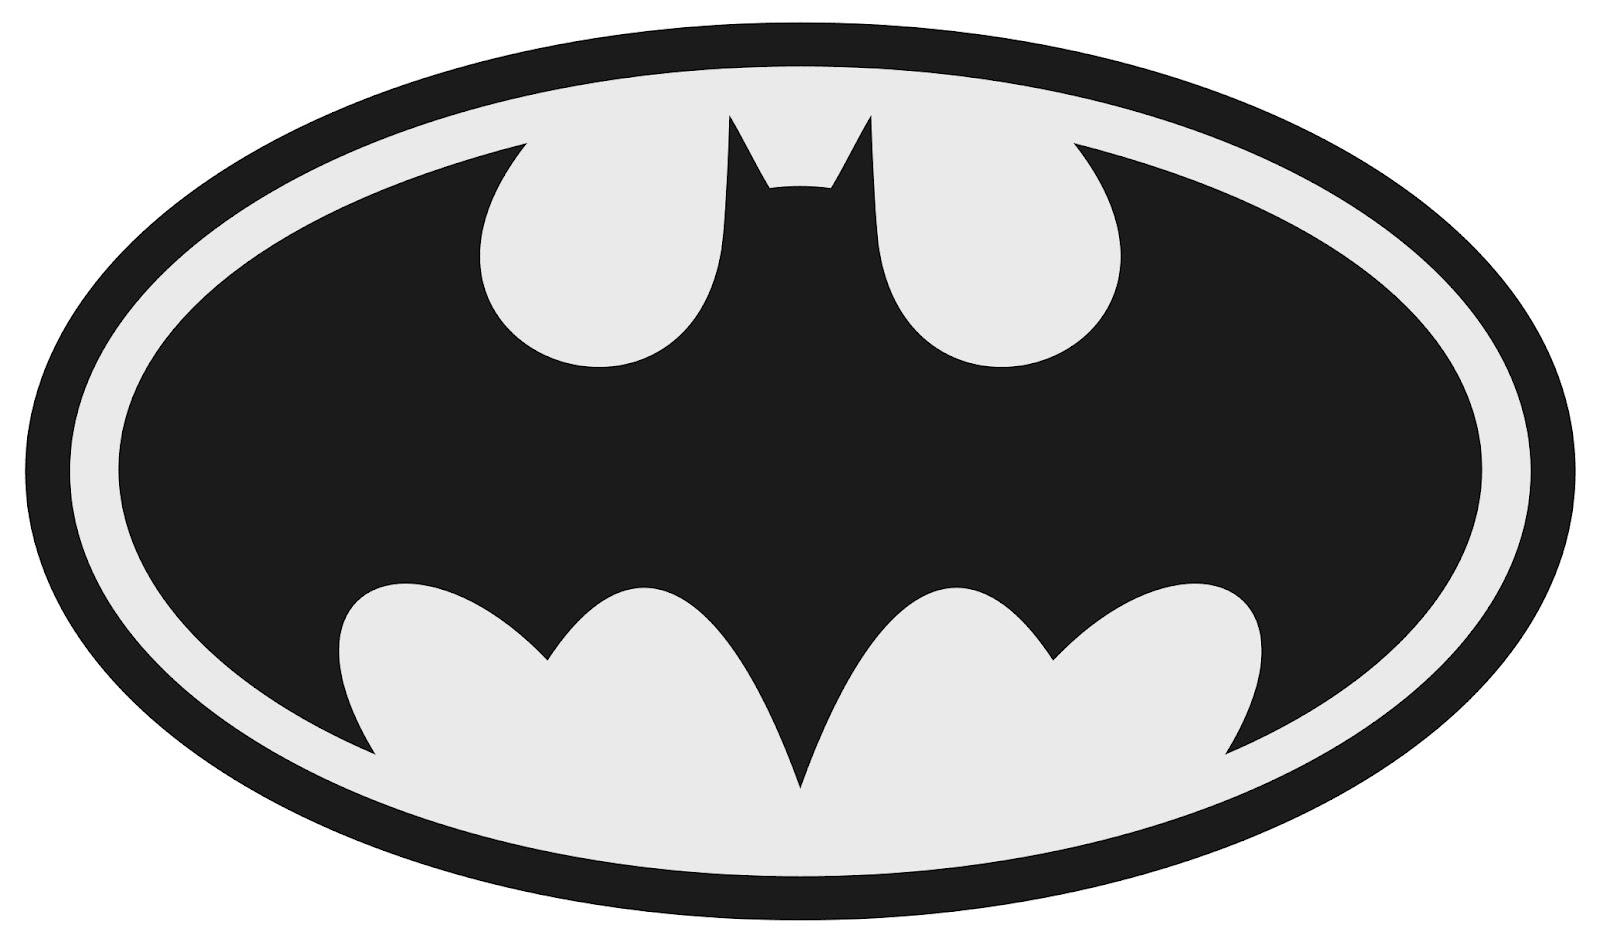 batman symbol silhouette at getdrawings com free for personal use rh getdrawings com batman logo pumpkin stencil batman logo stencil large